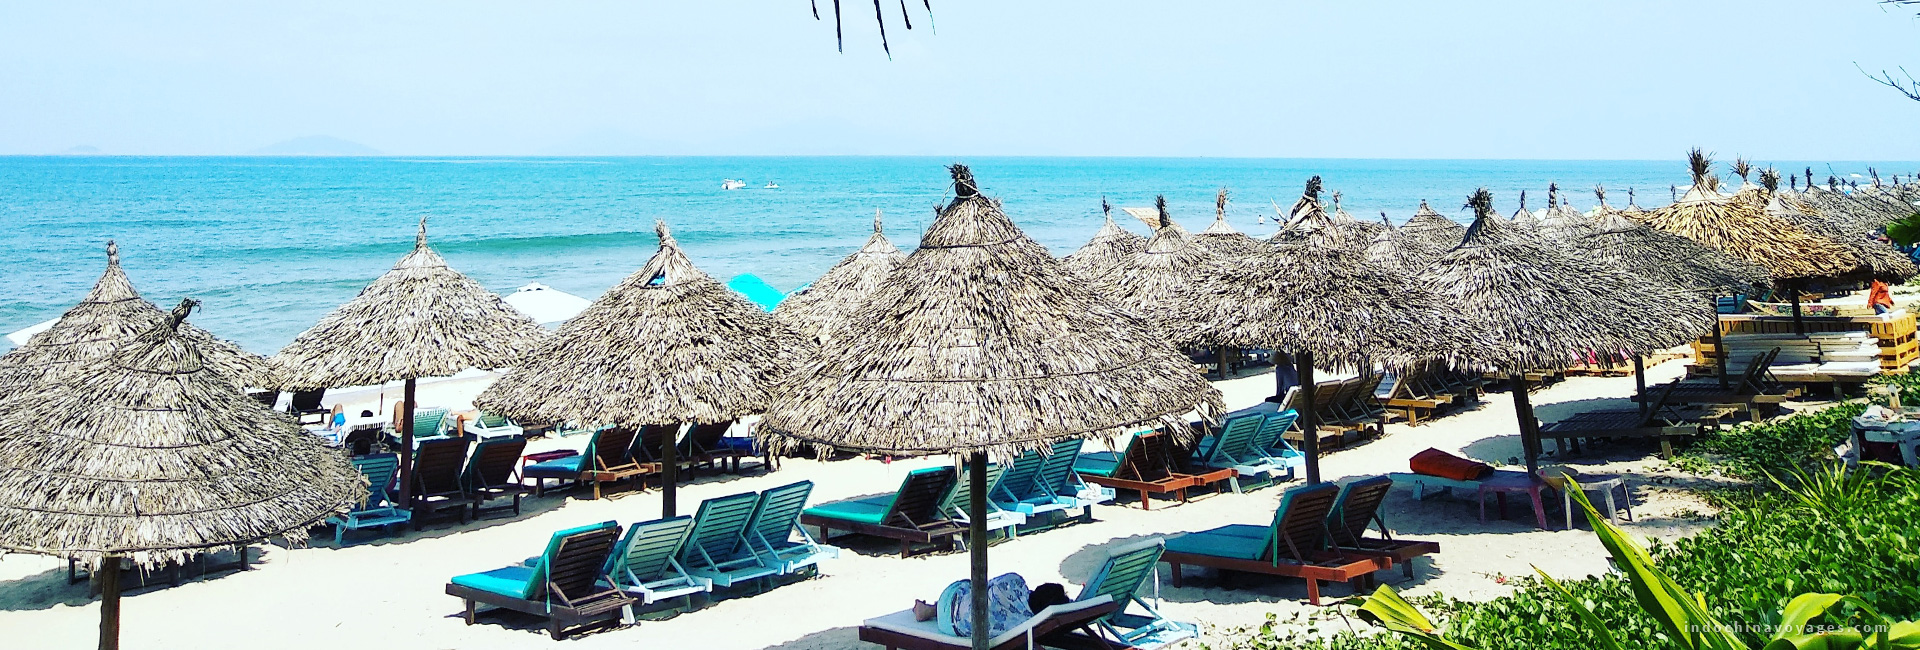 Top 8 pristine beaches in Vietnam